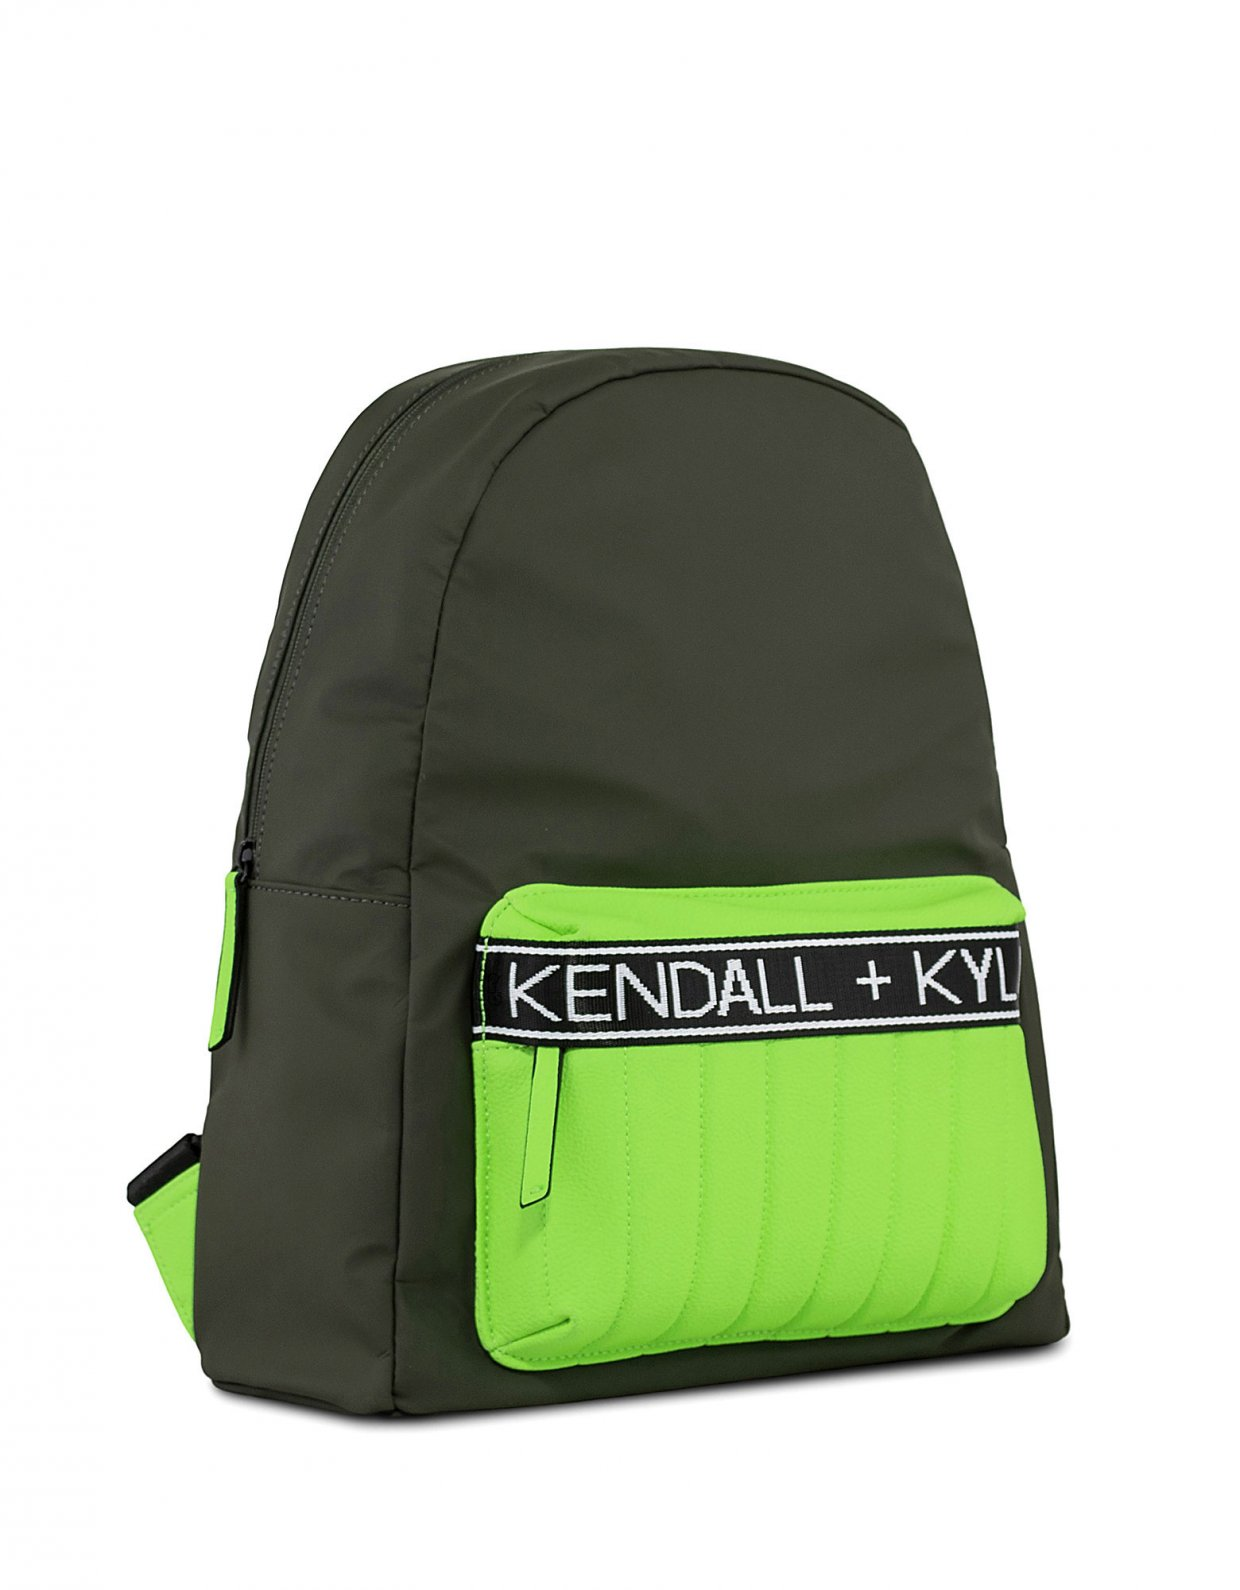 Kendall + Kylie Linz backpack khaki/neon green